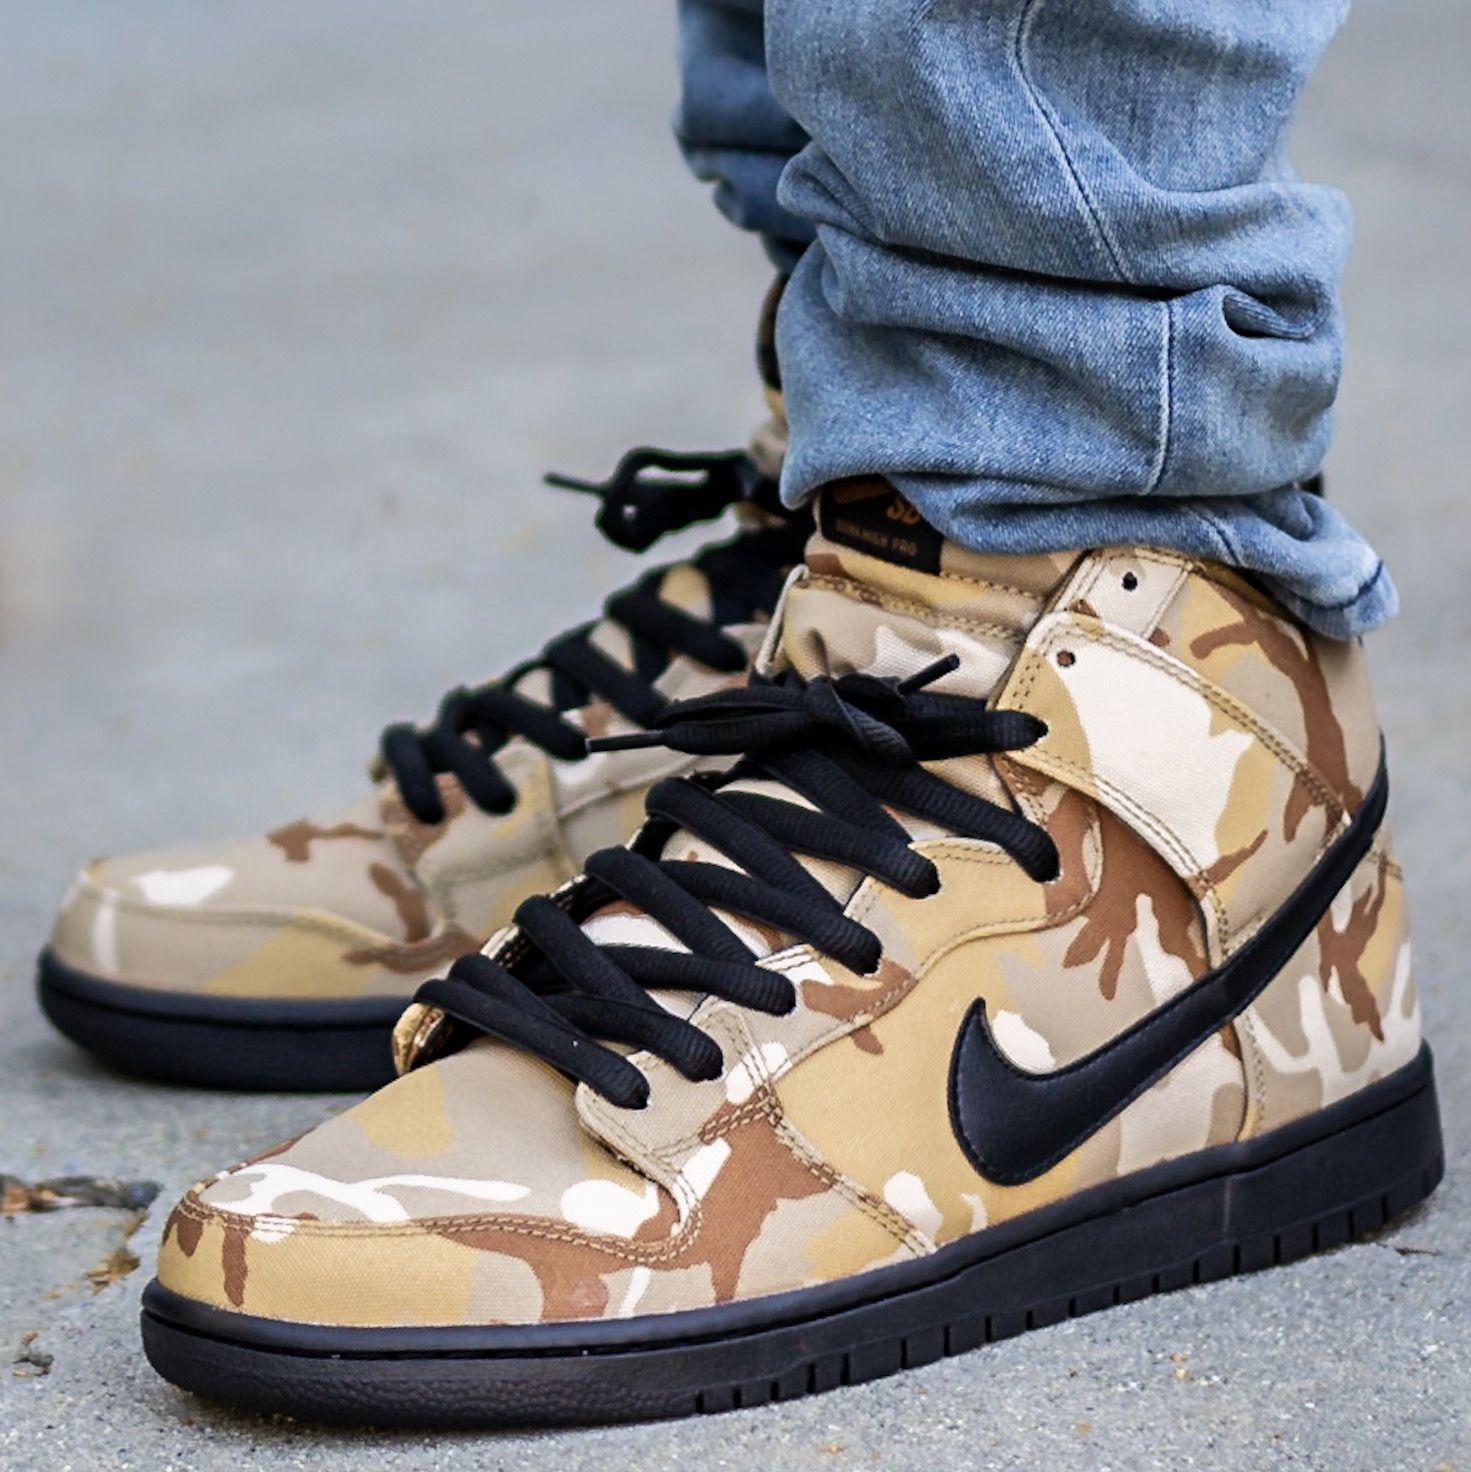 Pin on Lady Sneakerheads